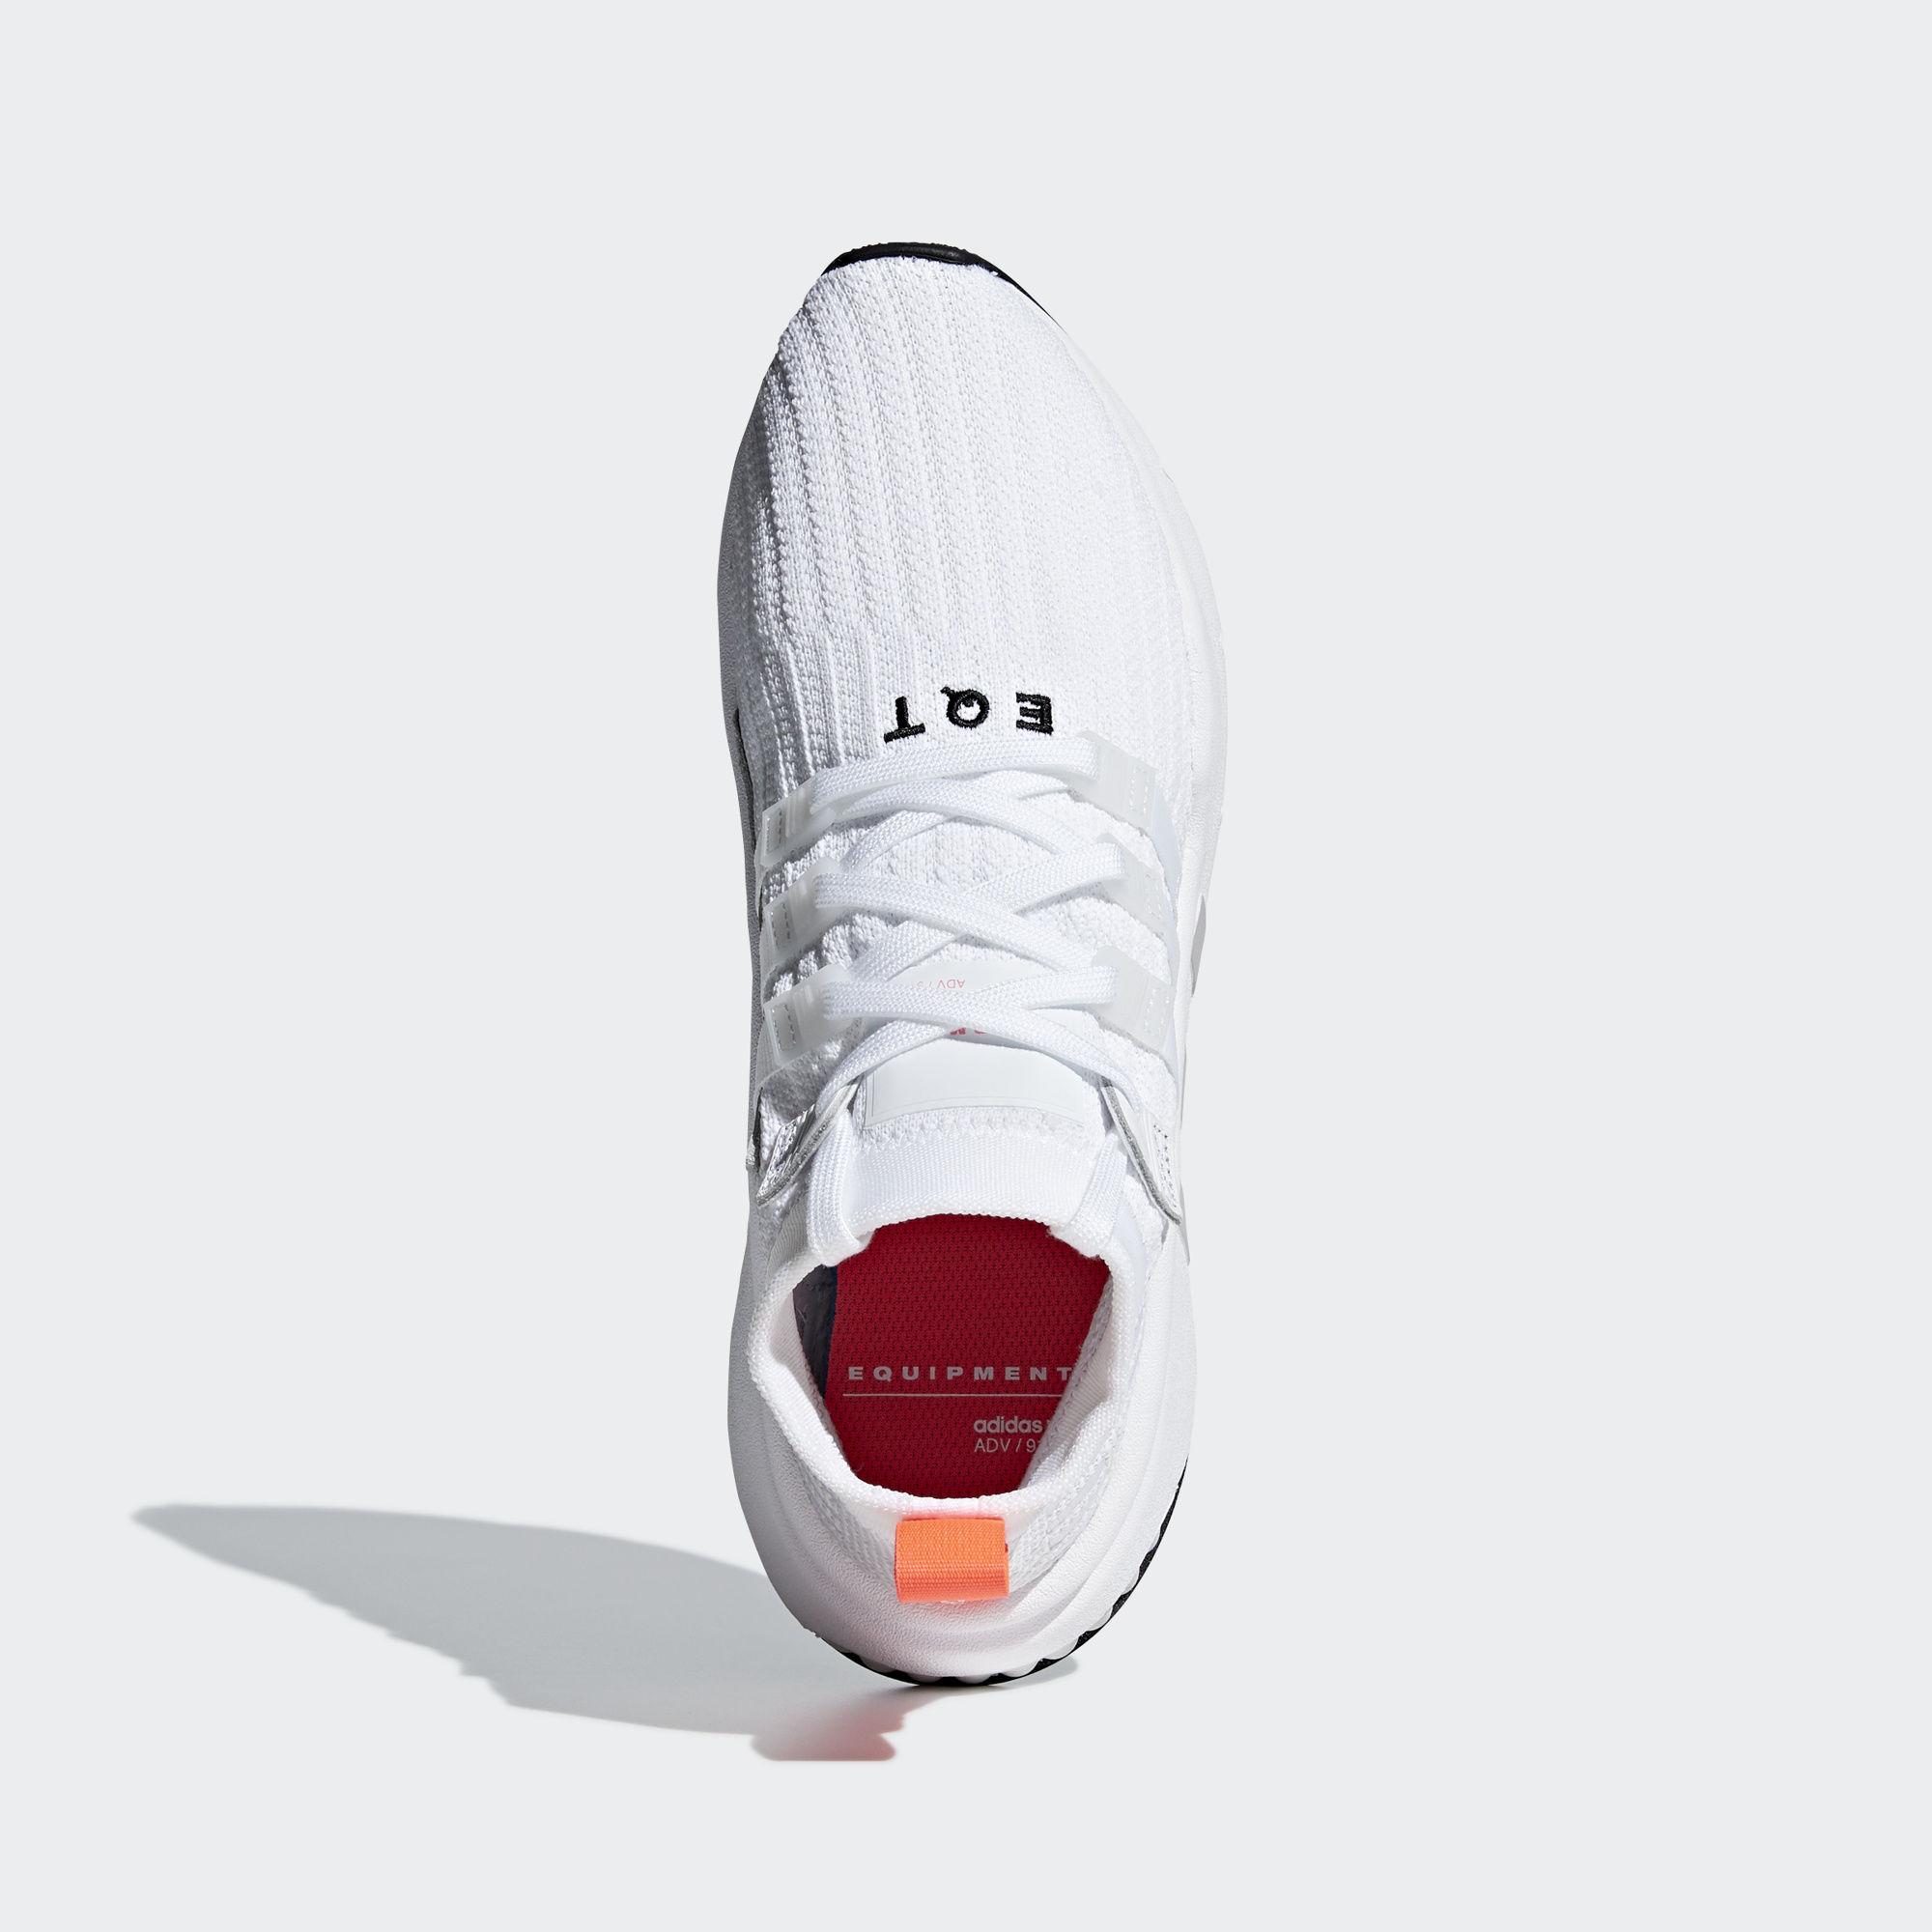 Adidas EQT Support Mid ADV Primeknit Ftwr White / Grey One / Core Black (B28133)